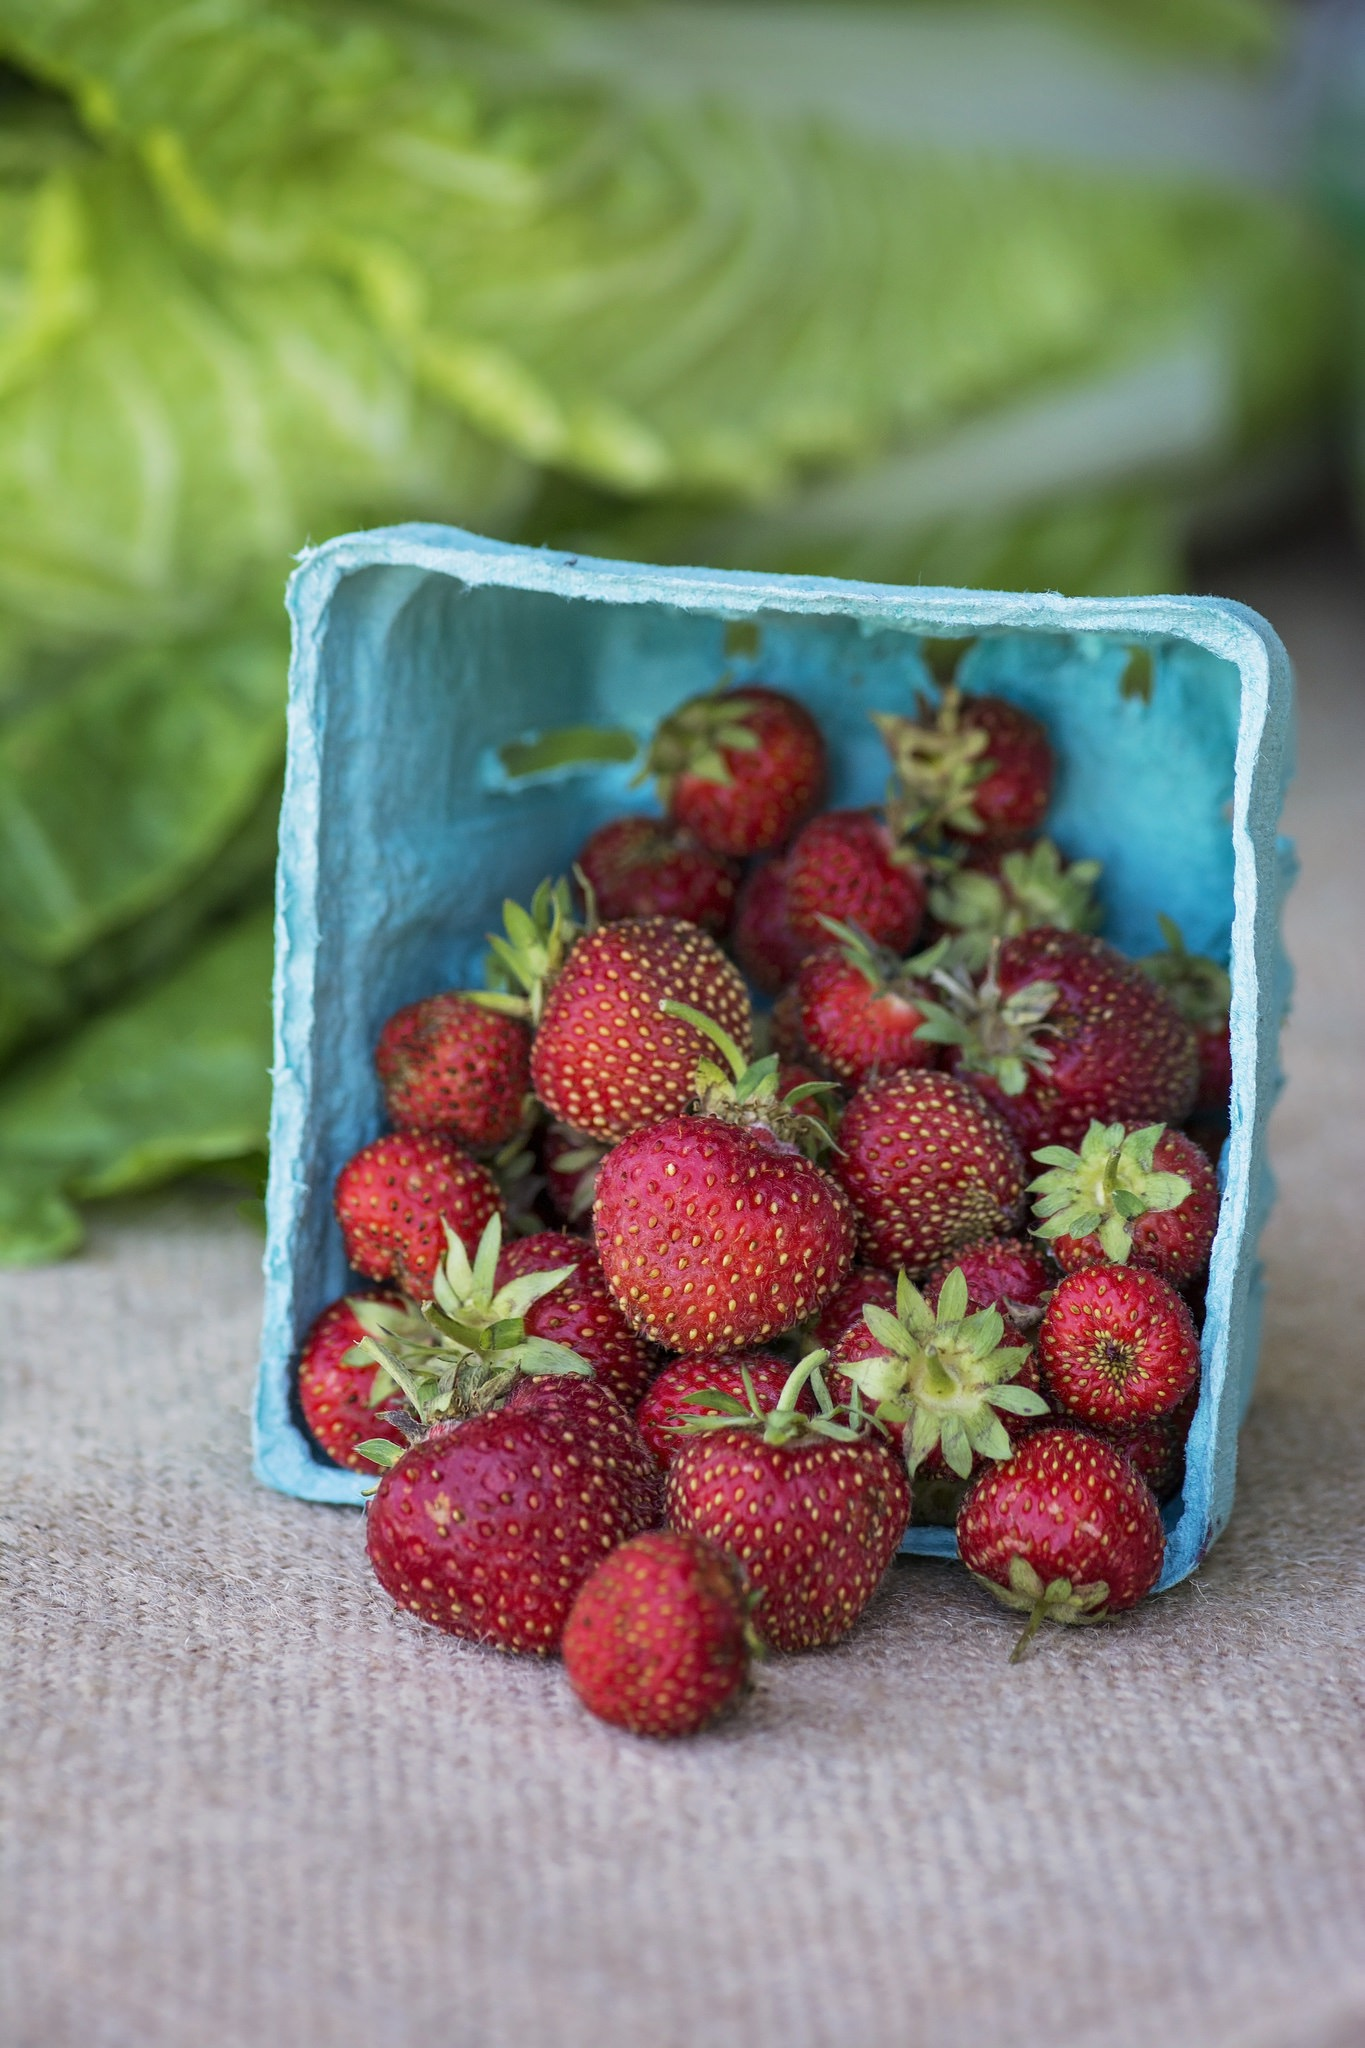 kristine_strawberries_spiritedtable_photot1.jpg